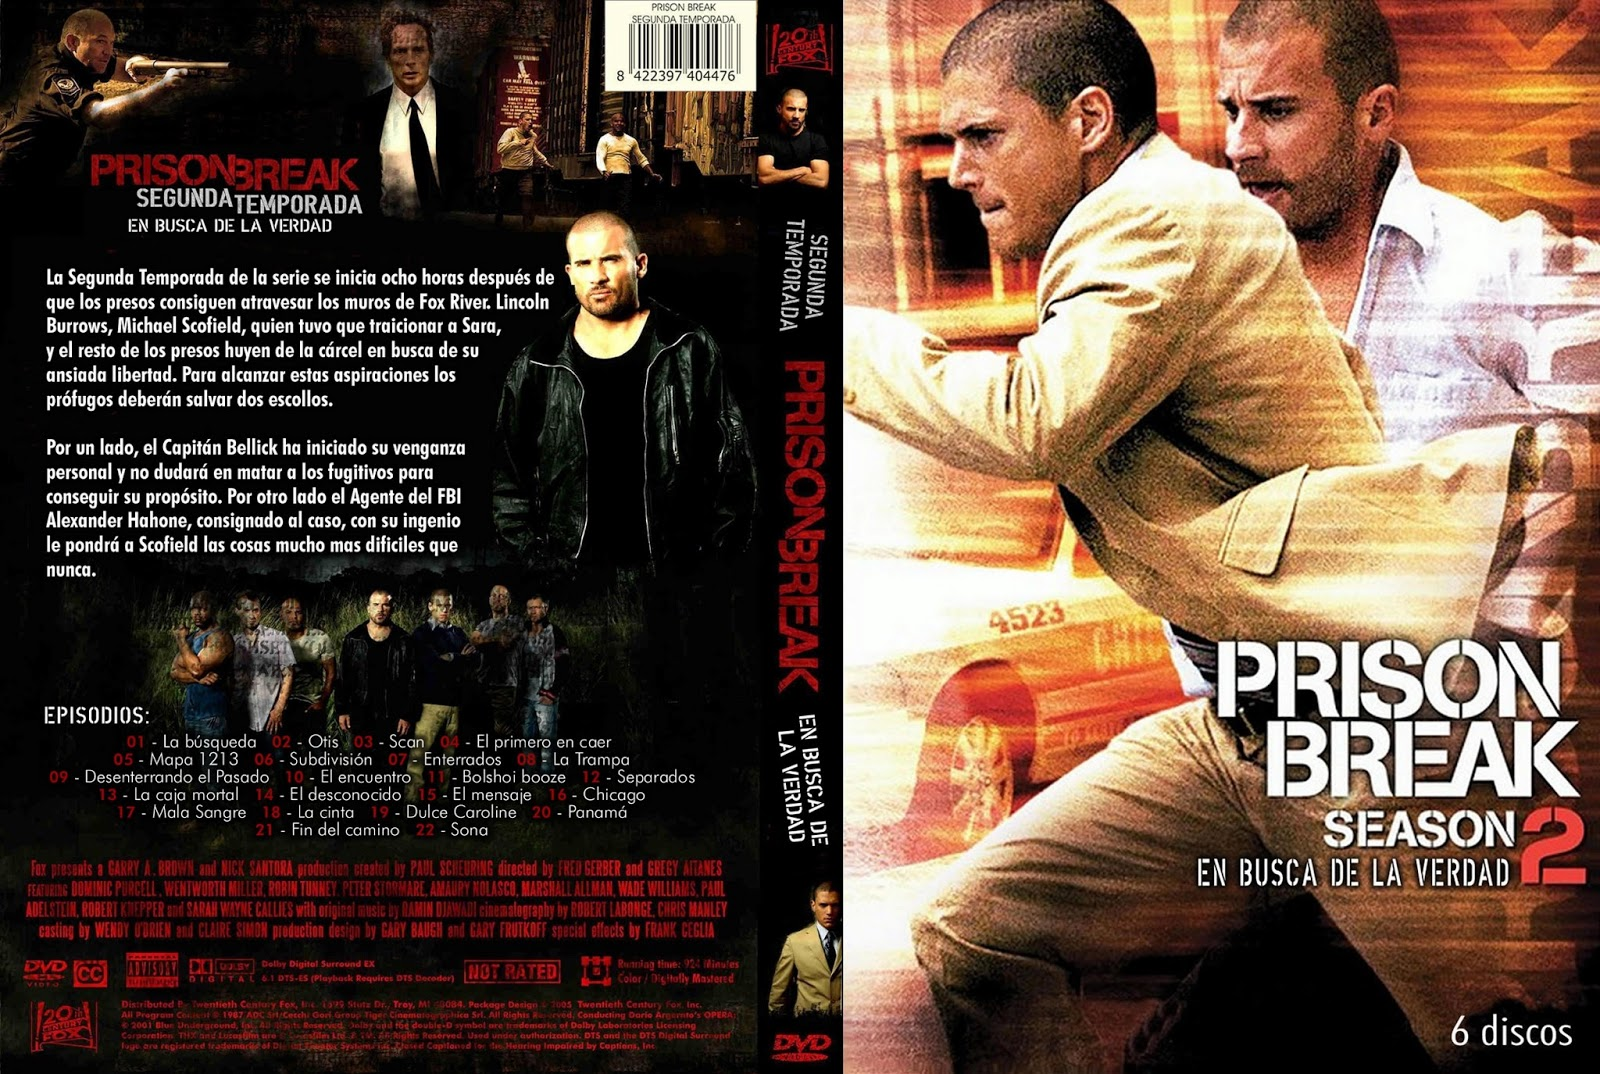 Prison break segunda temporada legendado descarga » gaipanave. Cf.